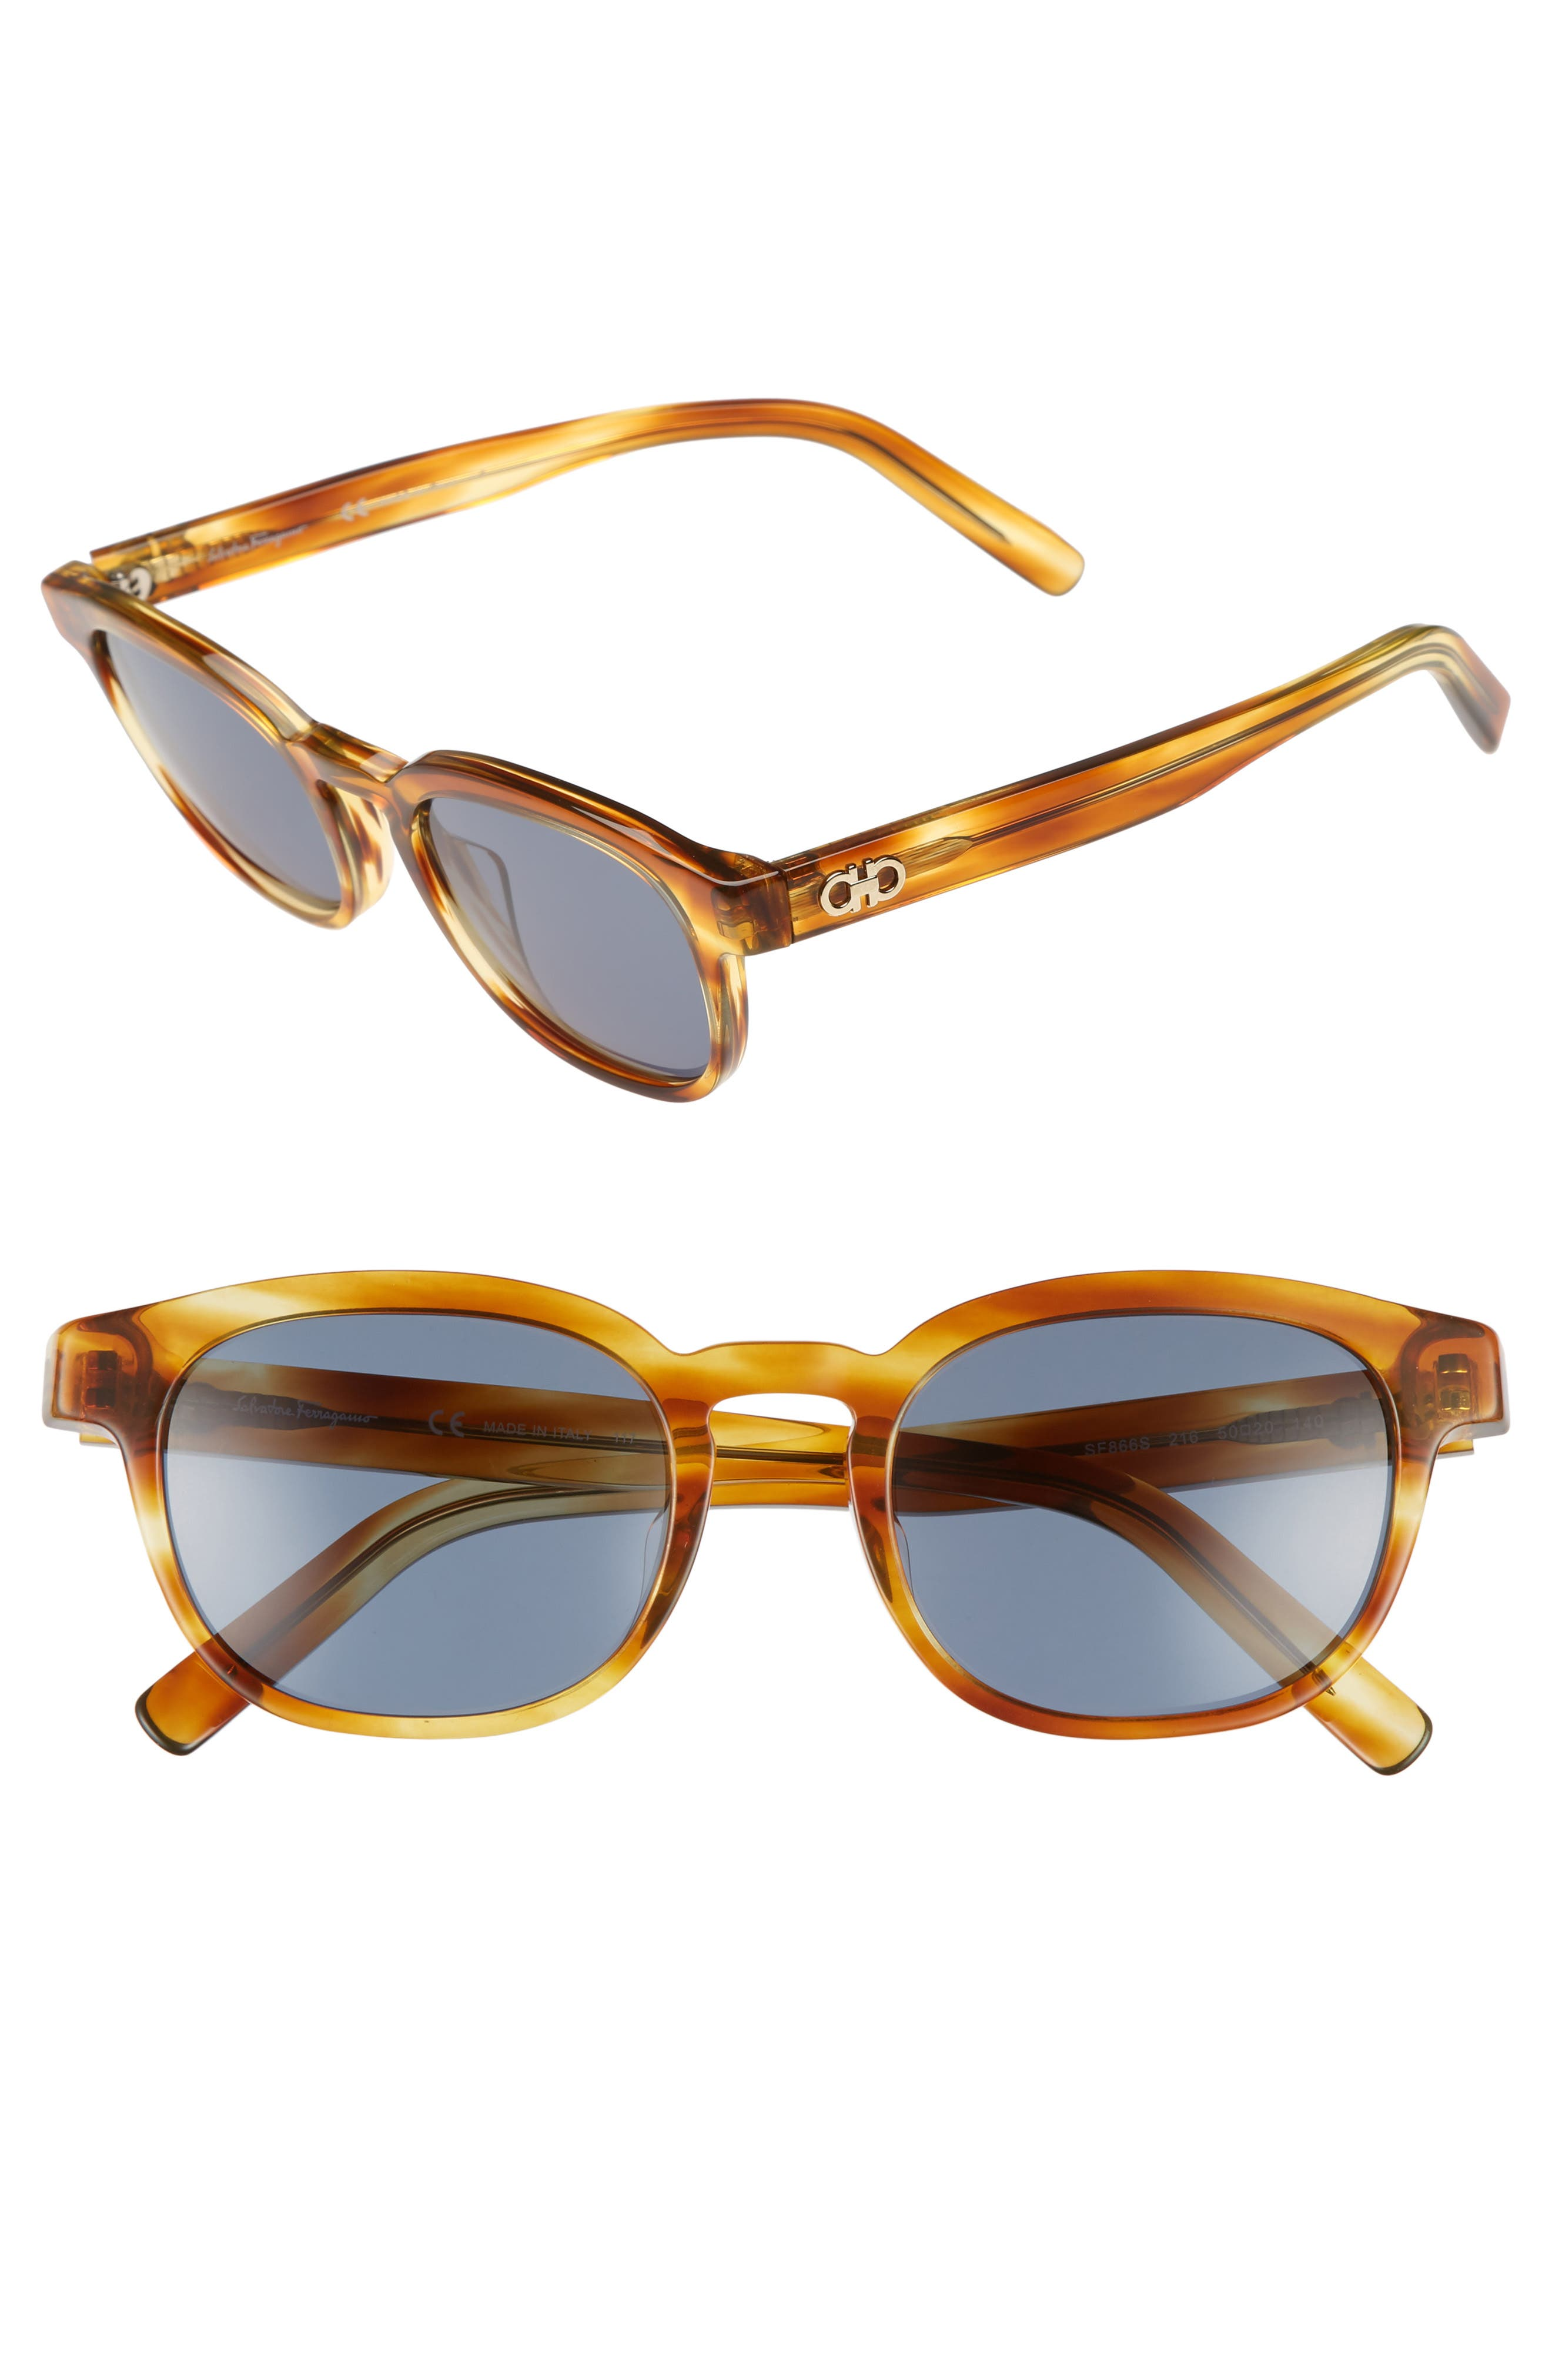 Main Image - Salvatore Ferragamo 866S 50mm Sunglasses